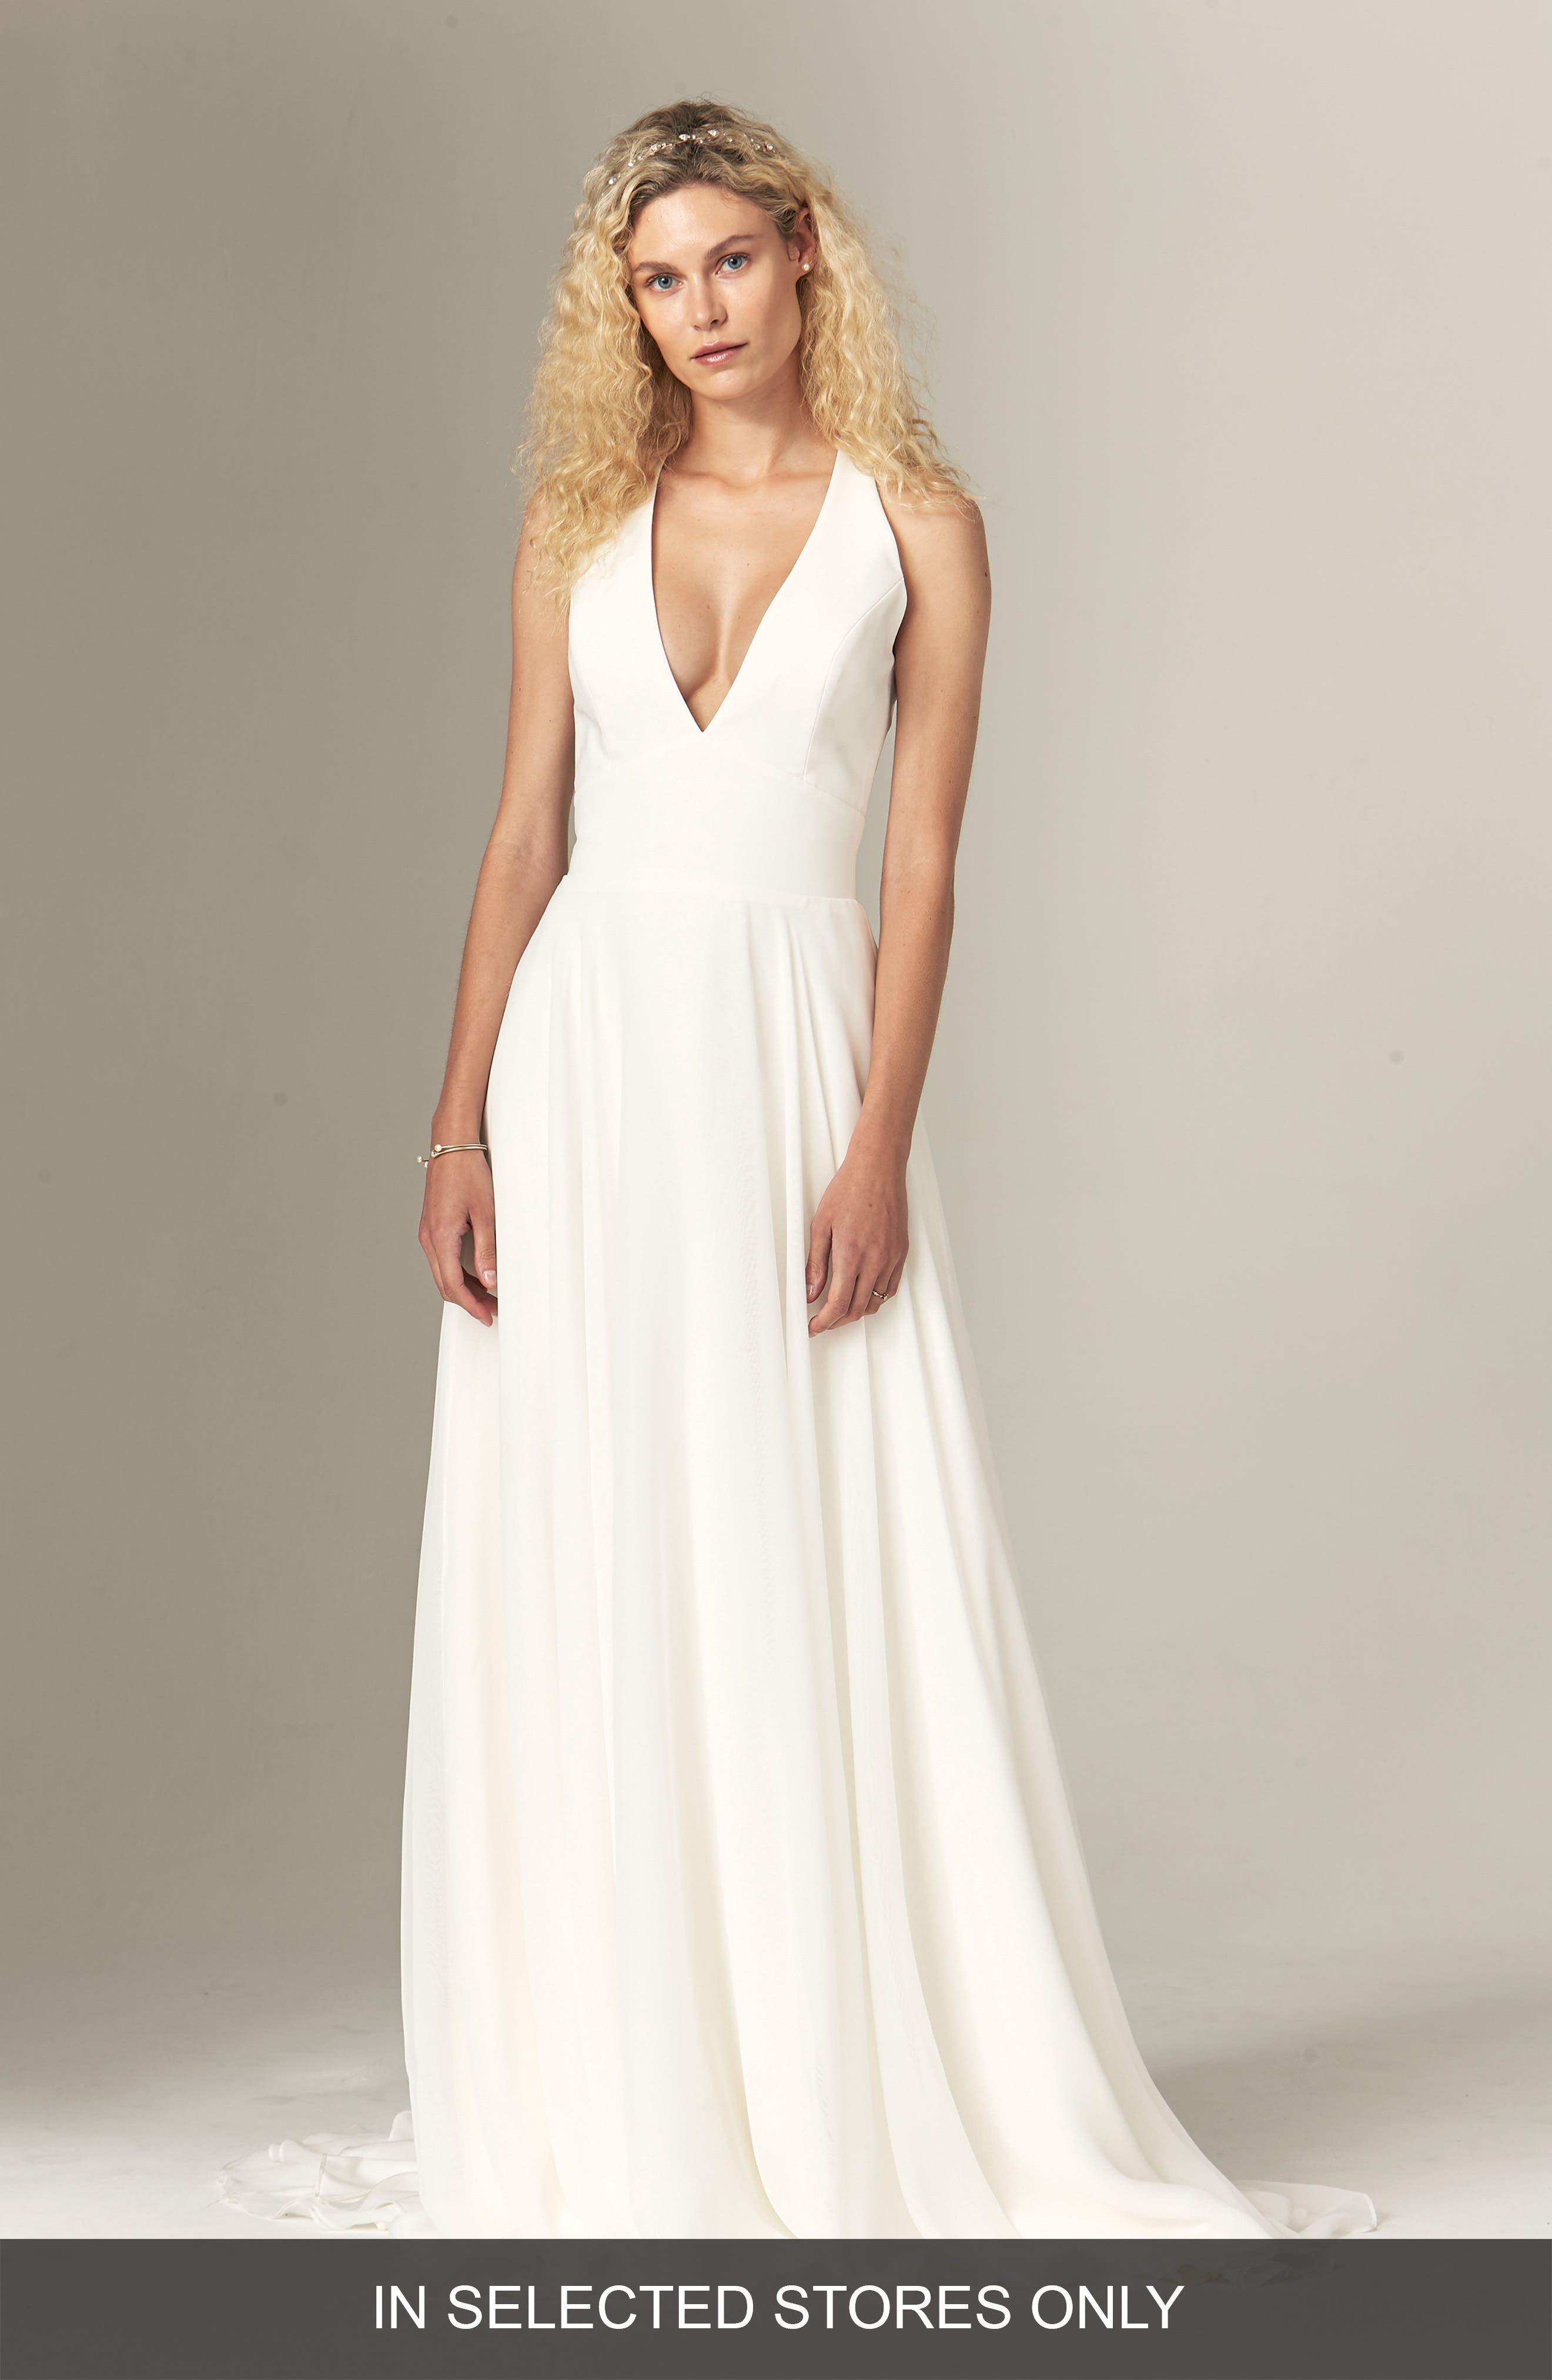 Halter Top Short Wedding Dresses with Sash